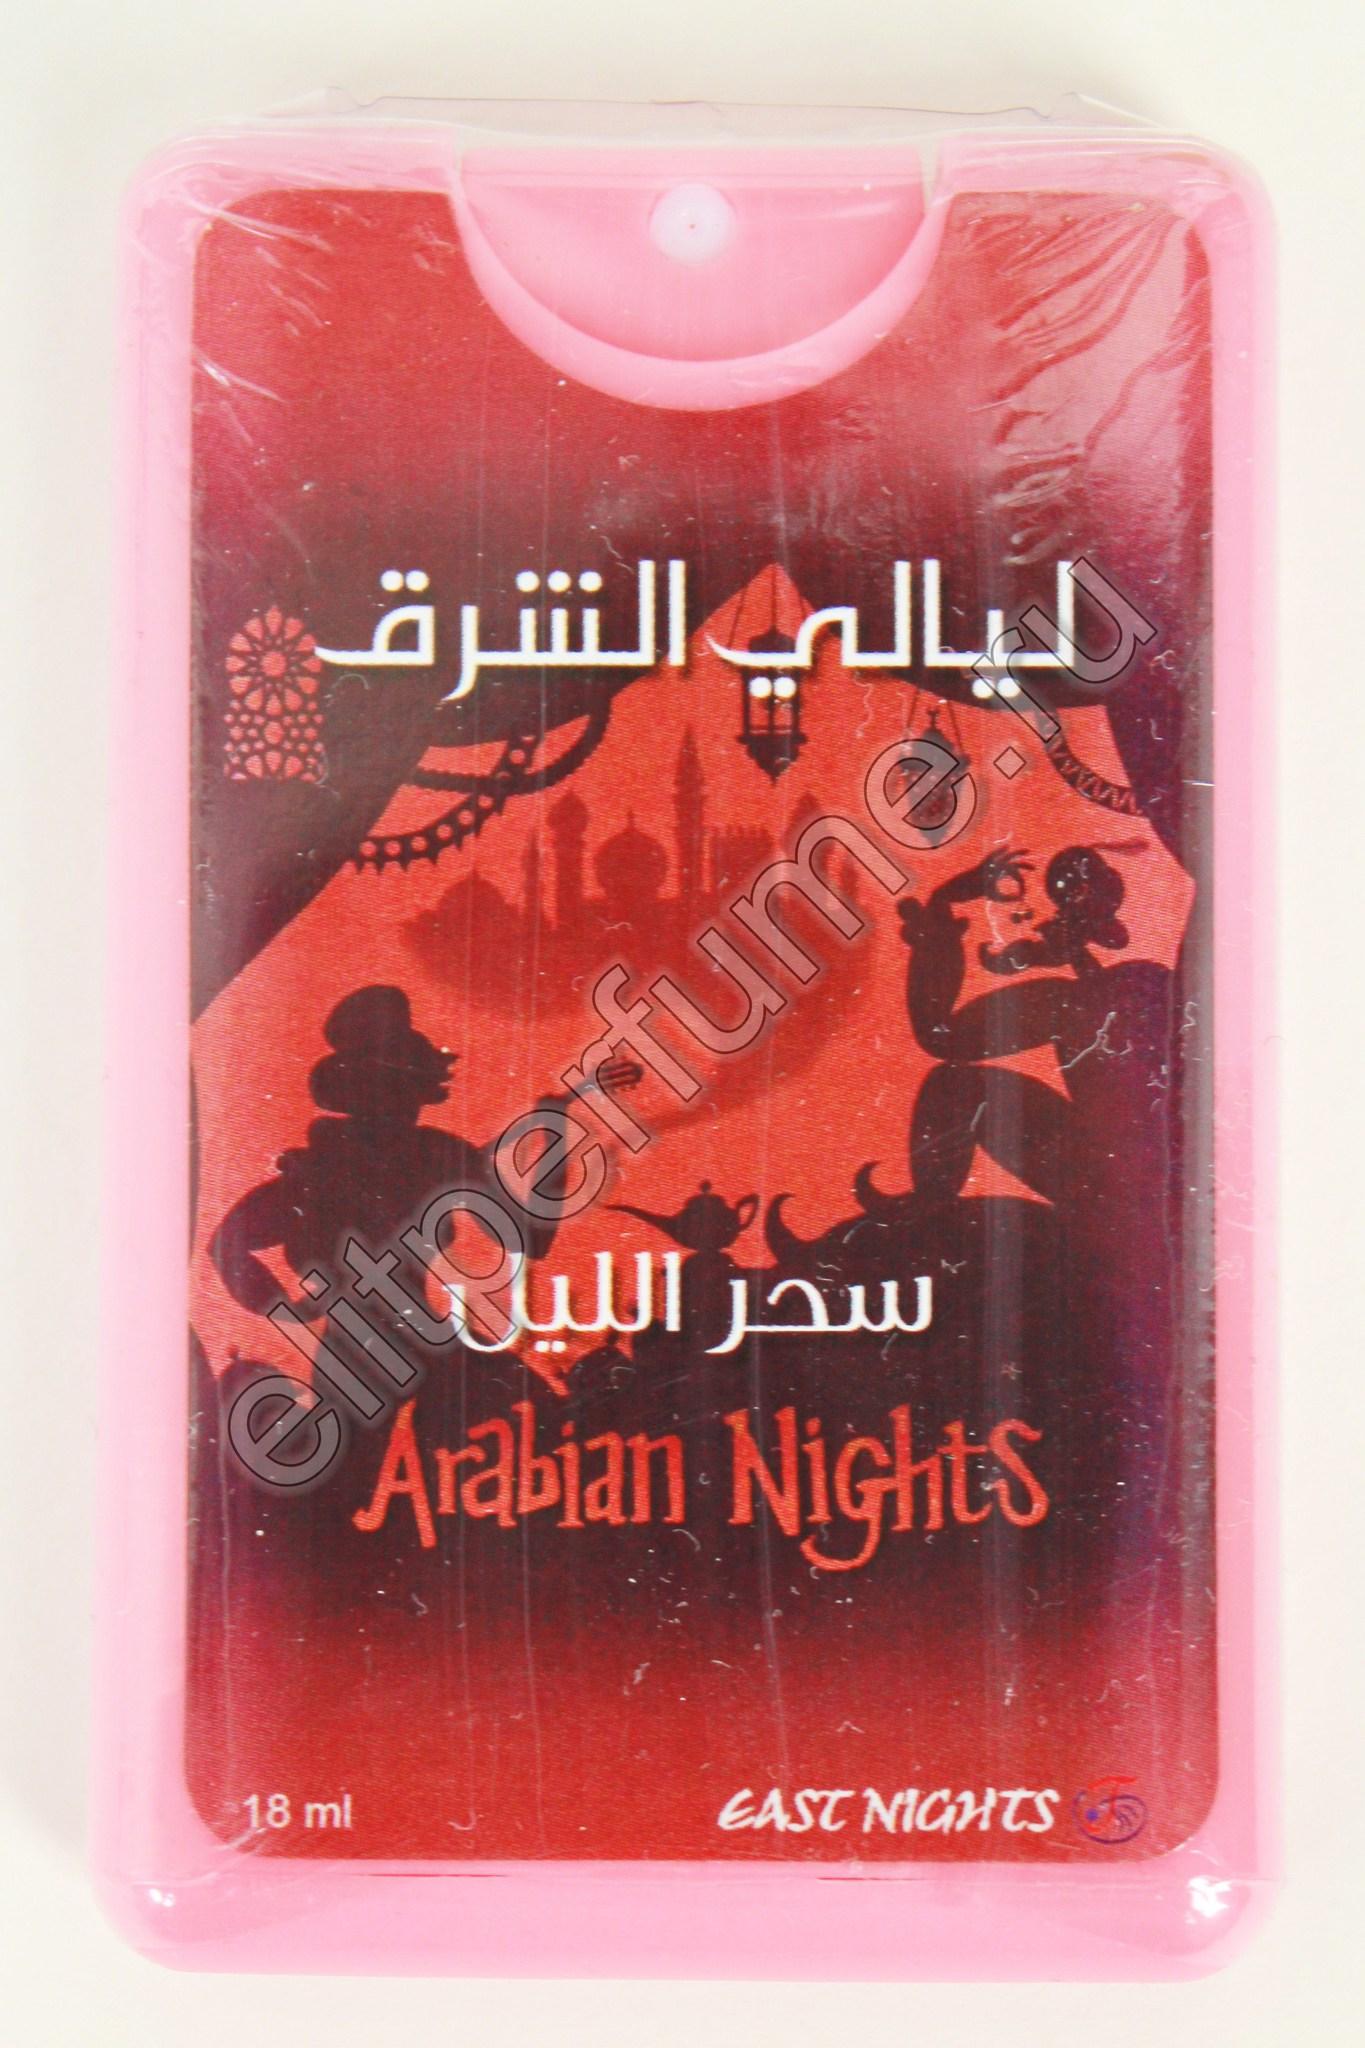 Arabian Nights / «Арабские ночи» 18 мл